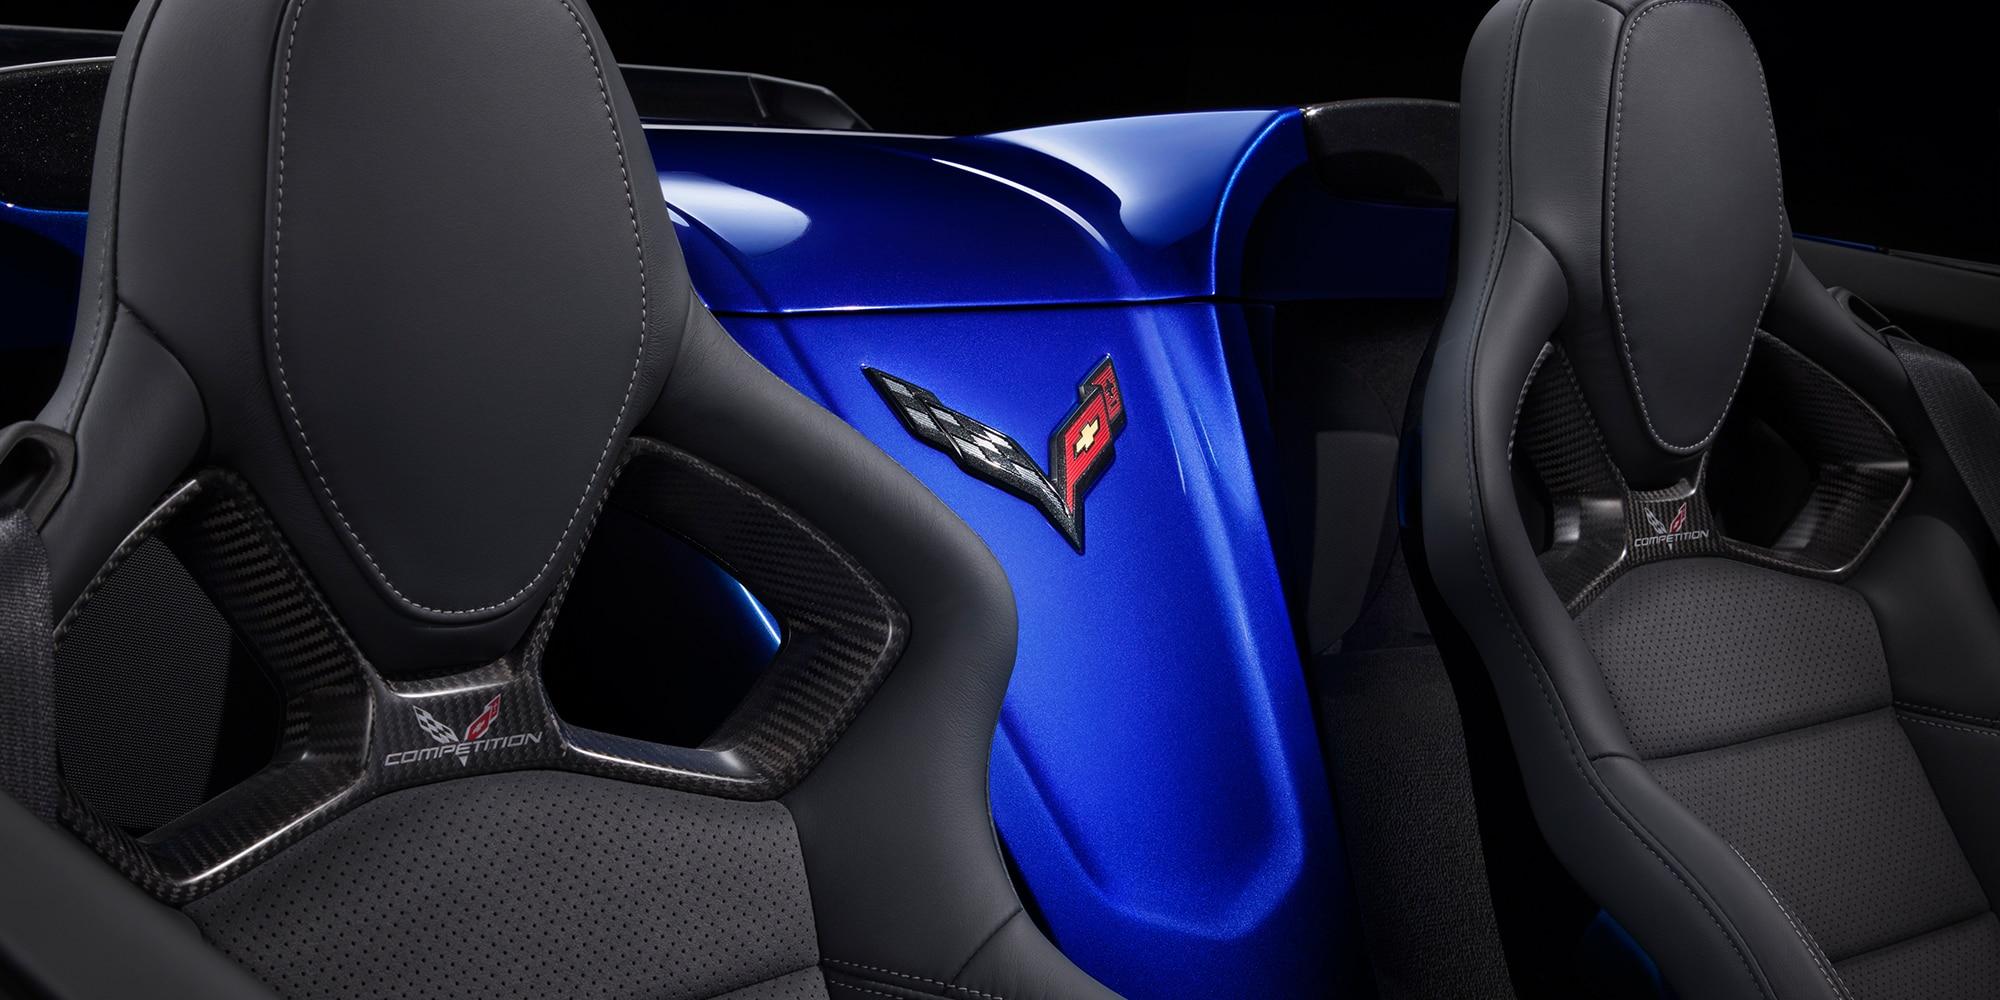 Diseño del superauto Corvette Z06 2018: asientos competition sport - Negro